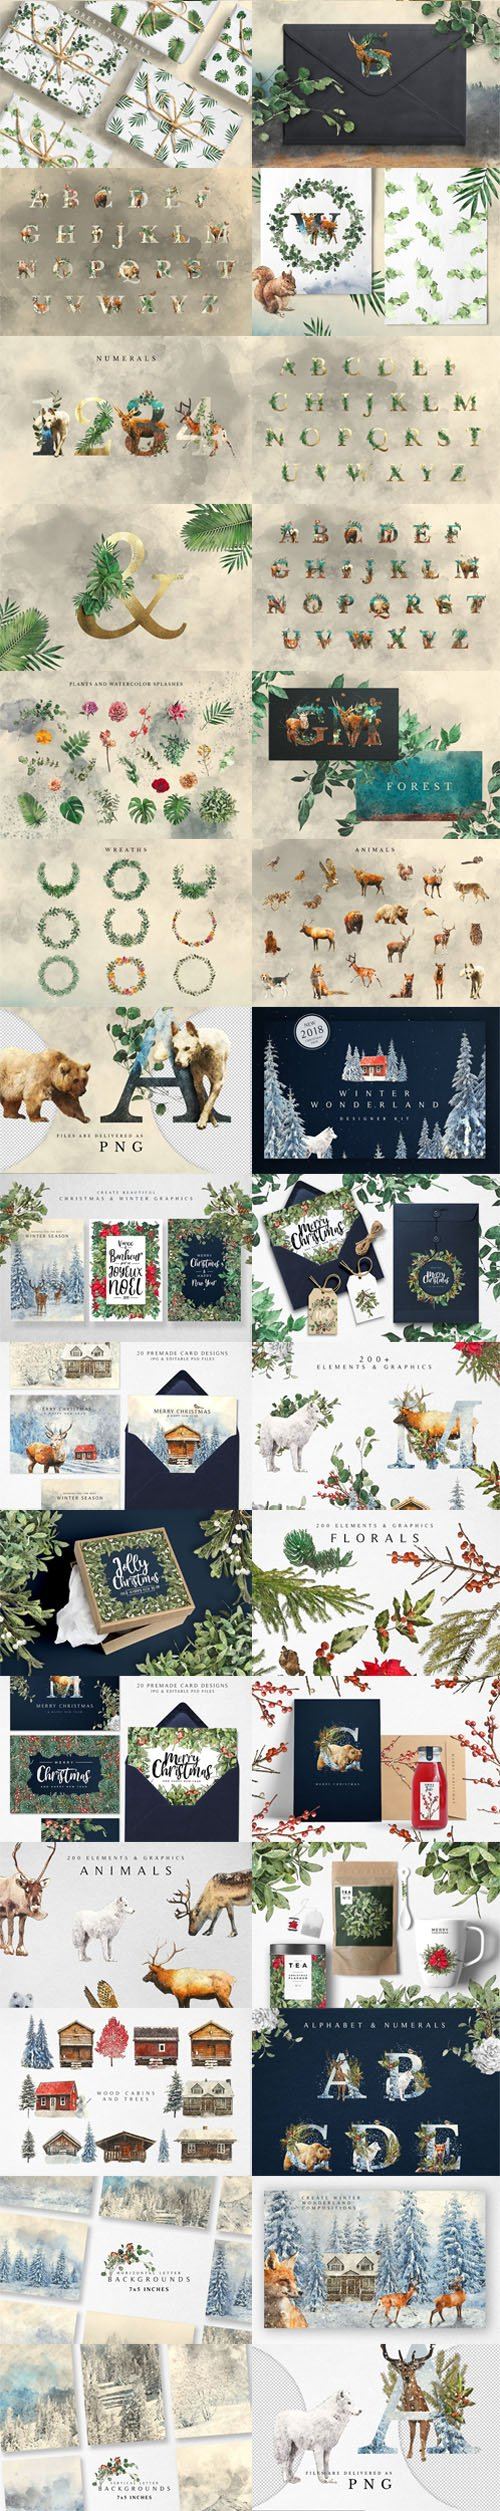 CM - Wonderful Designer Kit Bundle